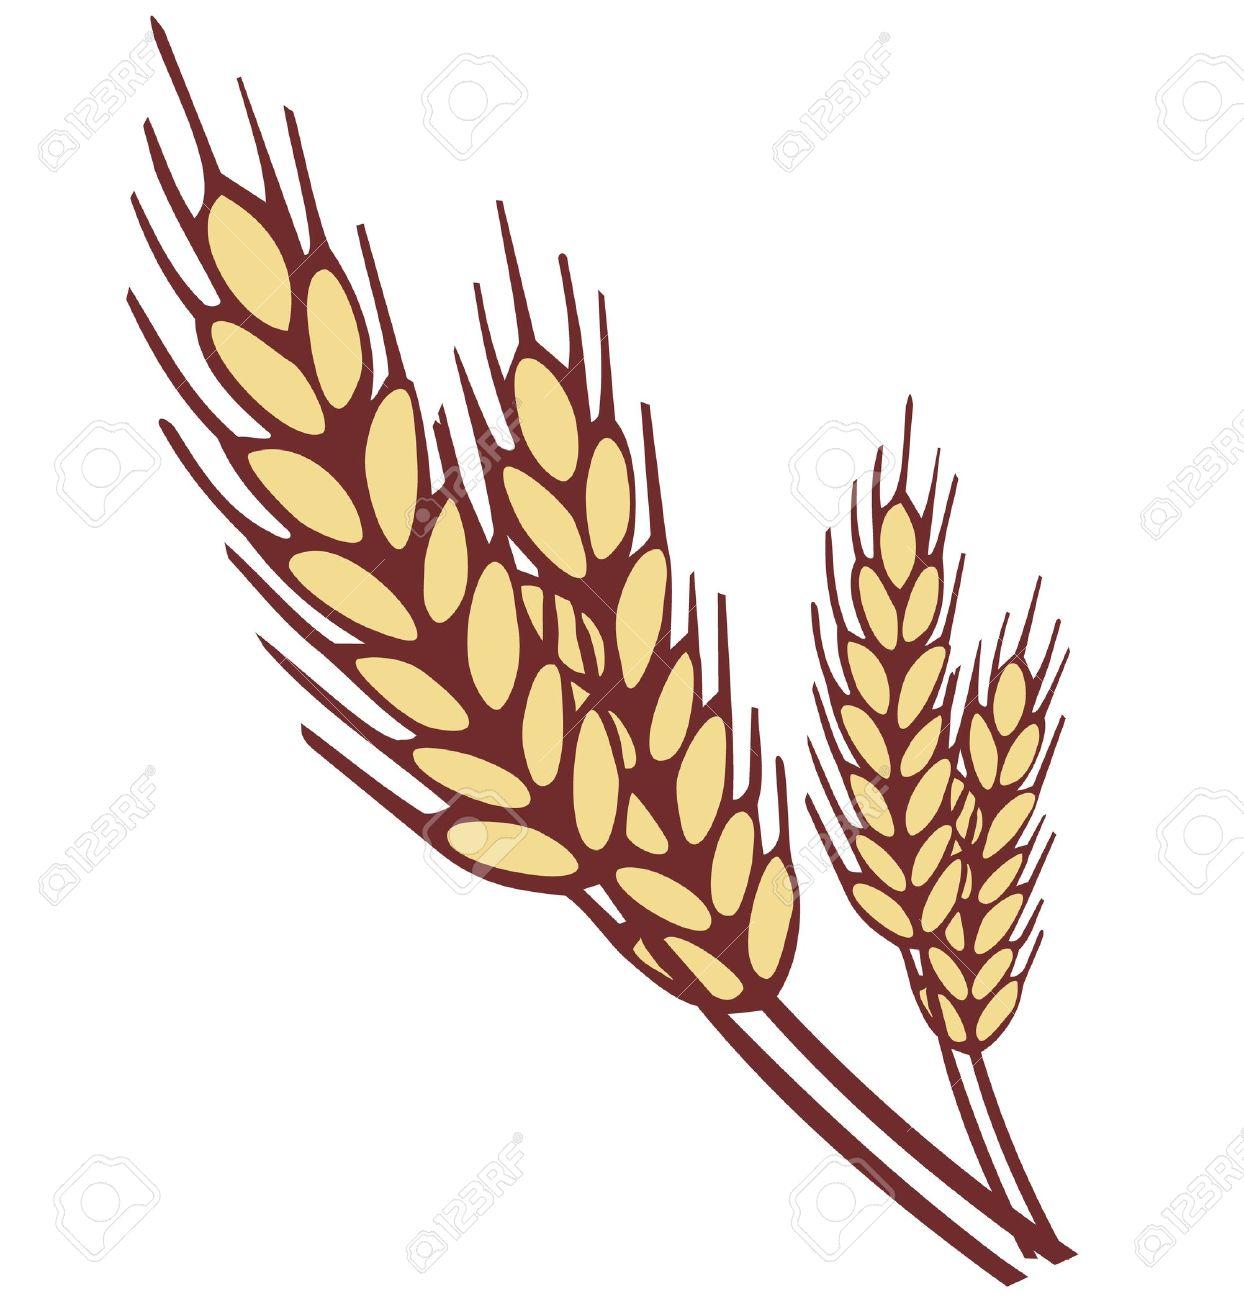 wheat ear royalty free cliparts vectors and stock illustration rh 123rf com clip art of wheat stalks clip art of wheat rye barley